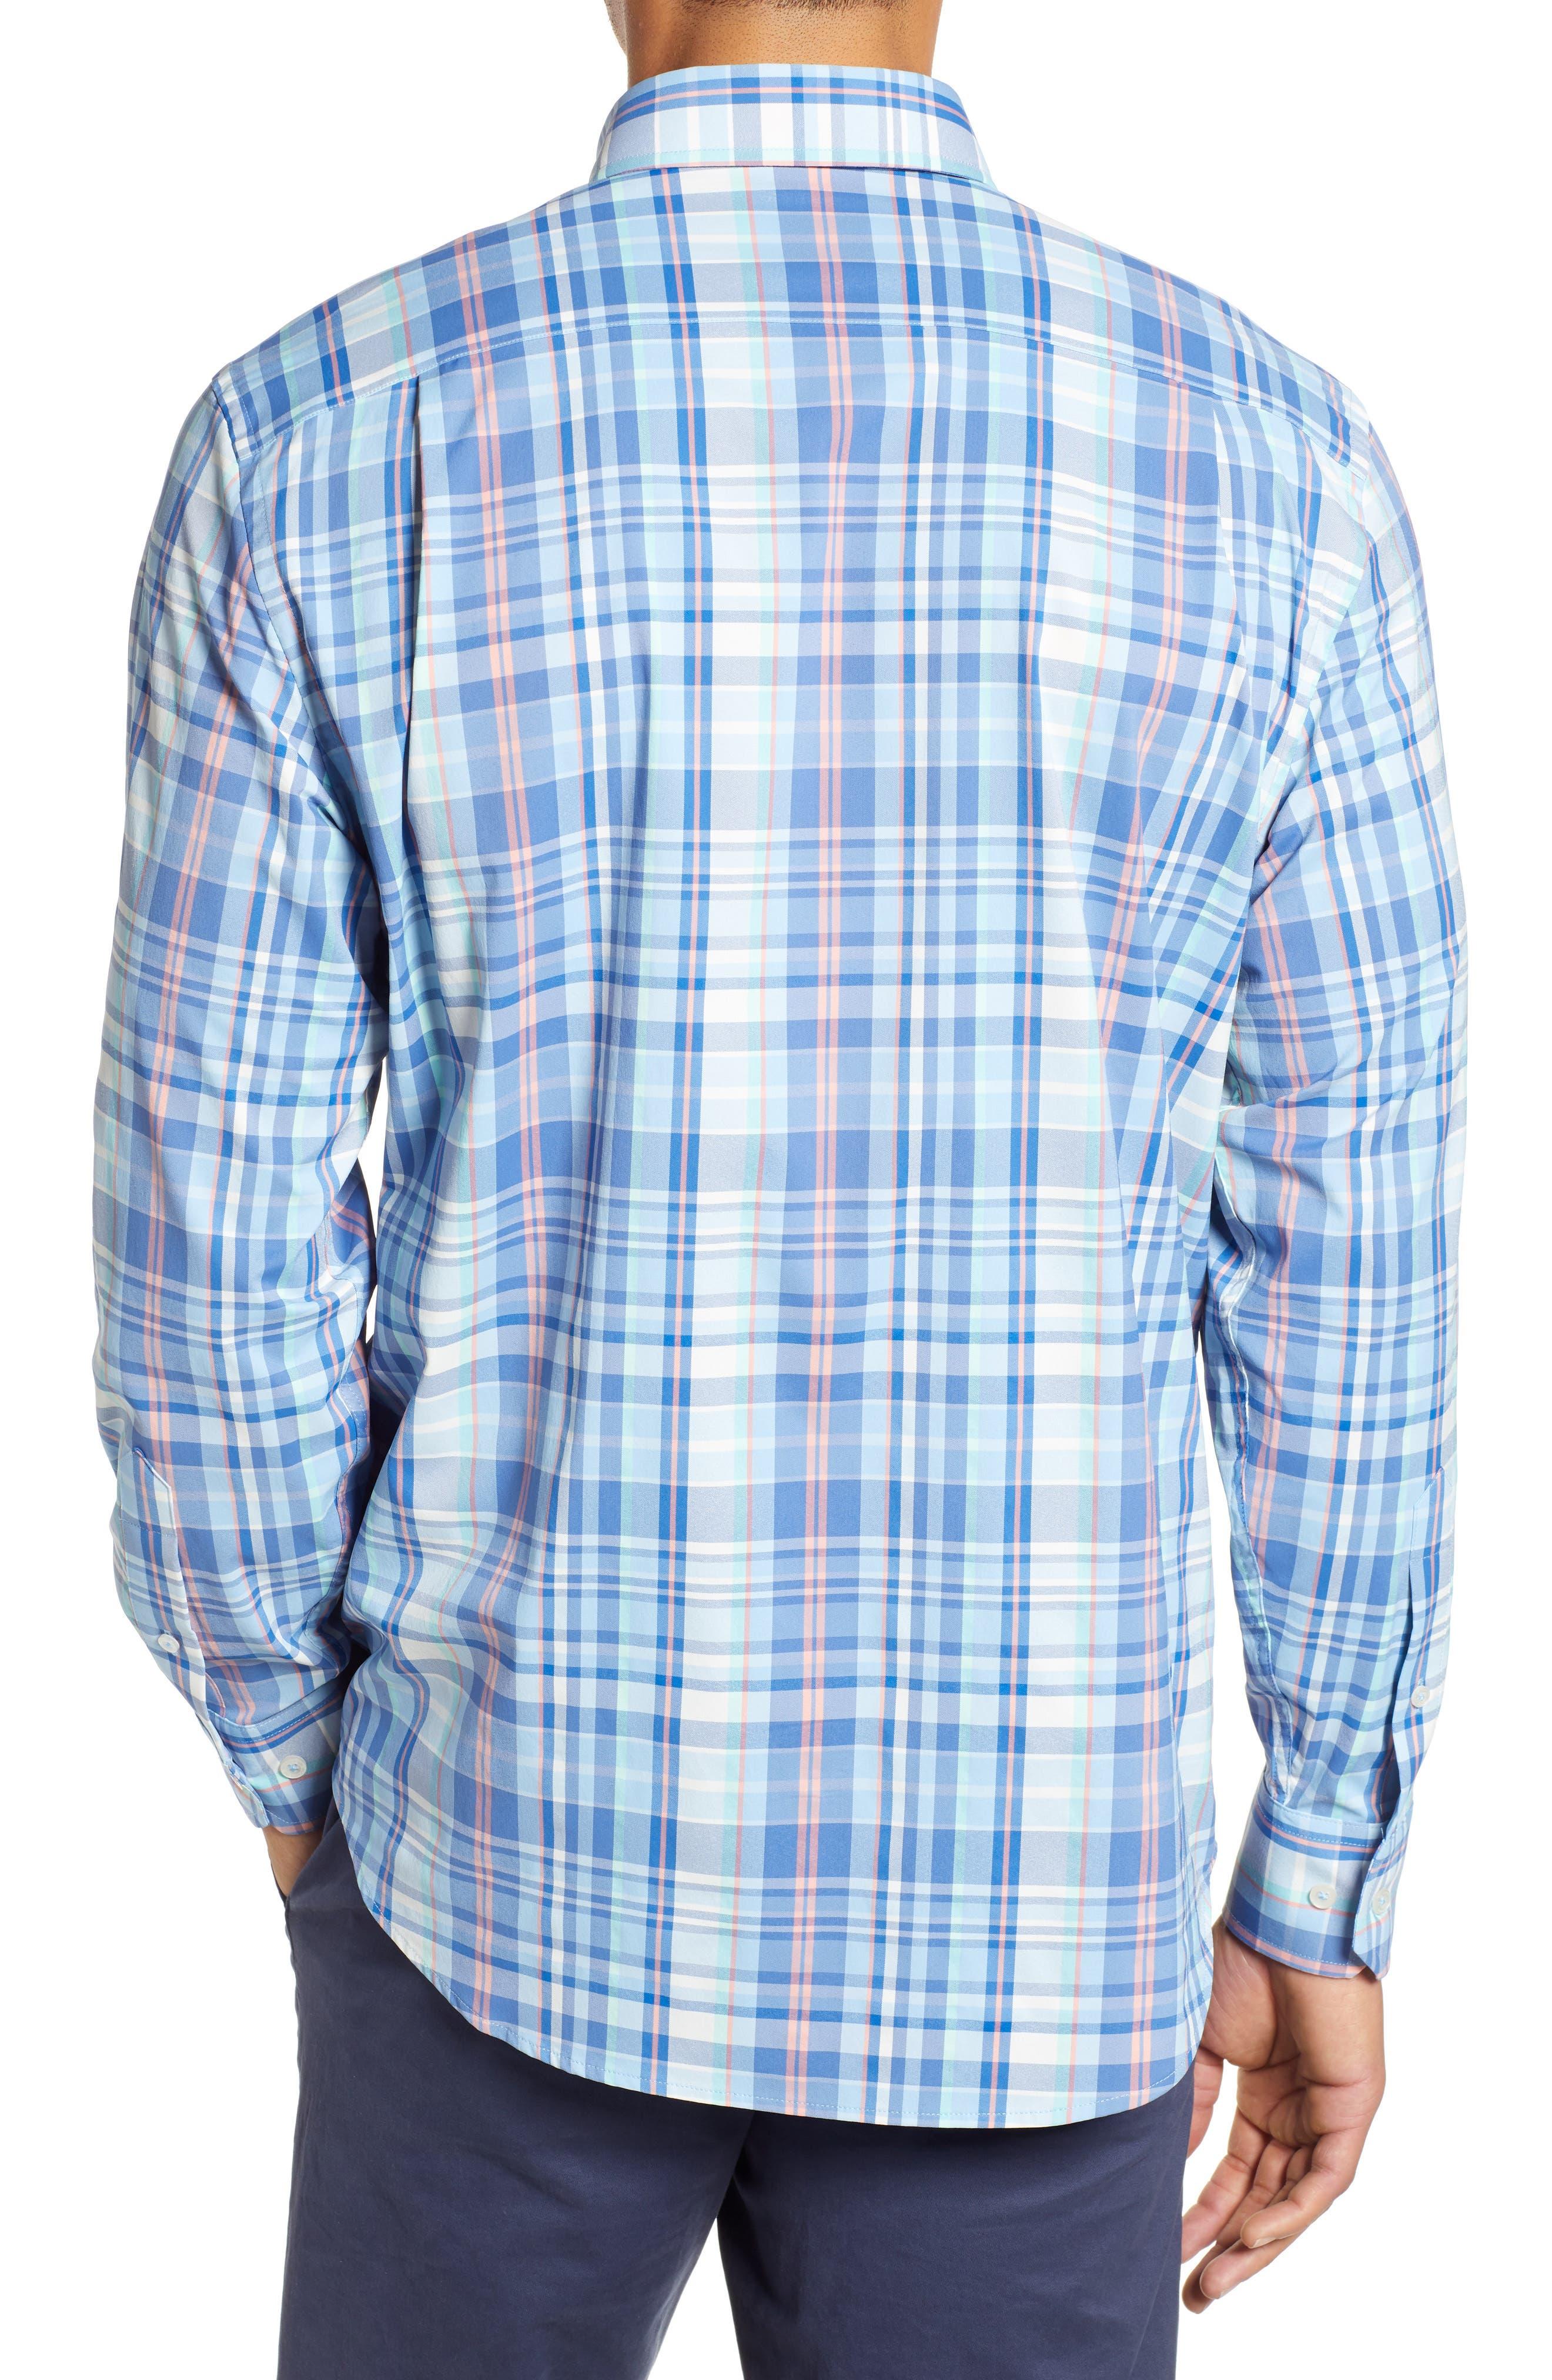 Siesta Intercoastal Regular Fit Plaid Performance Sport Shirt,                             Alternate thumbnail 3, color,                             SKY BLUE